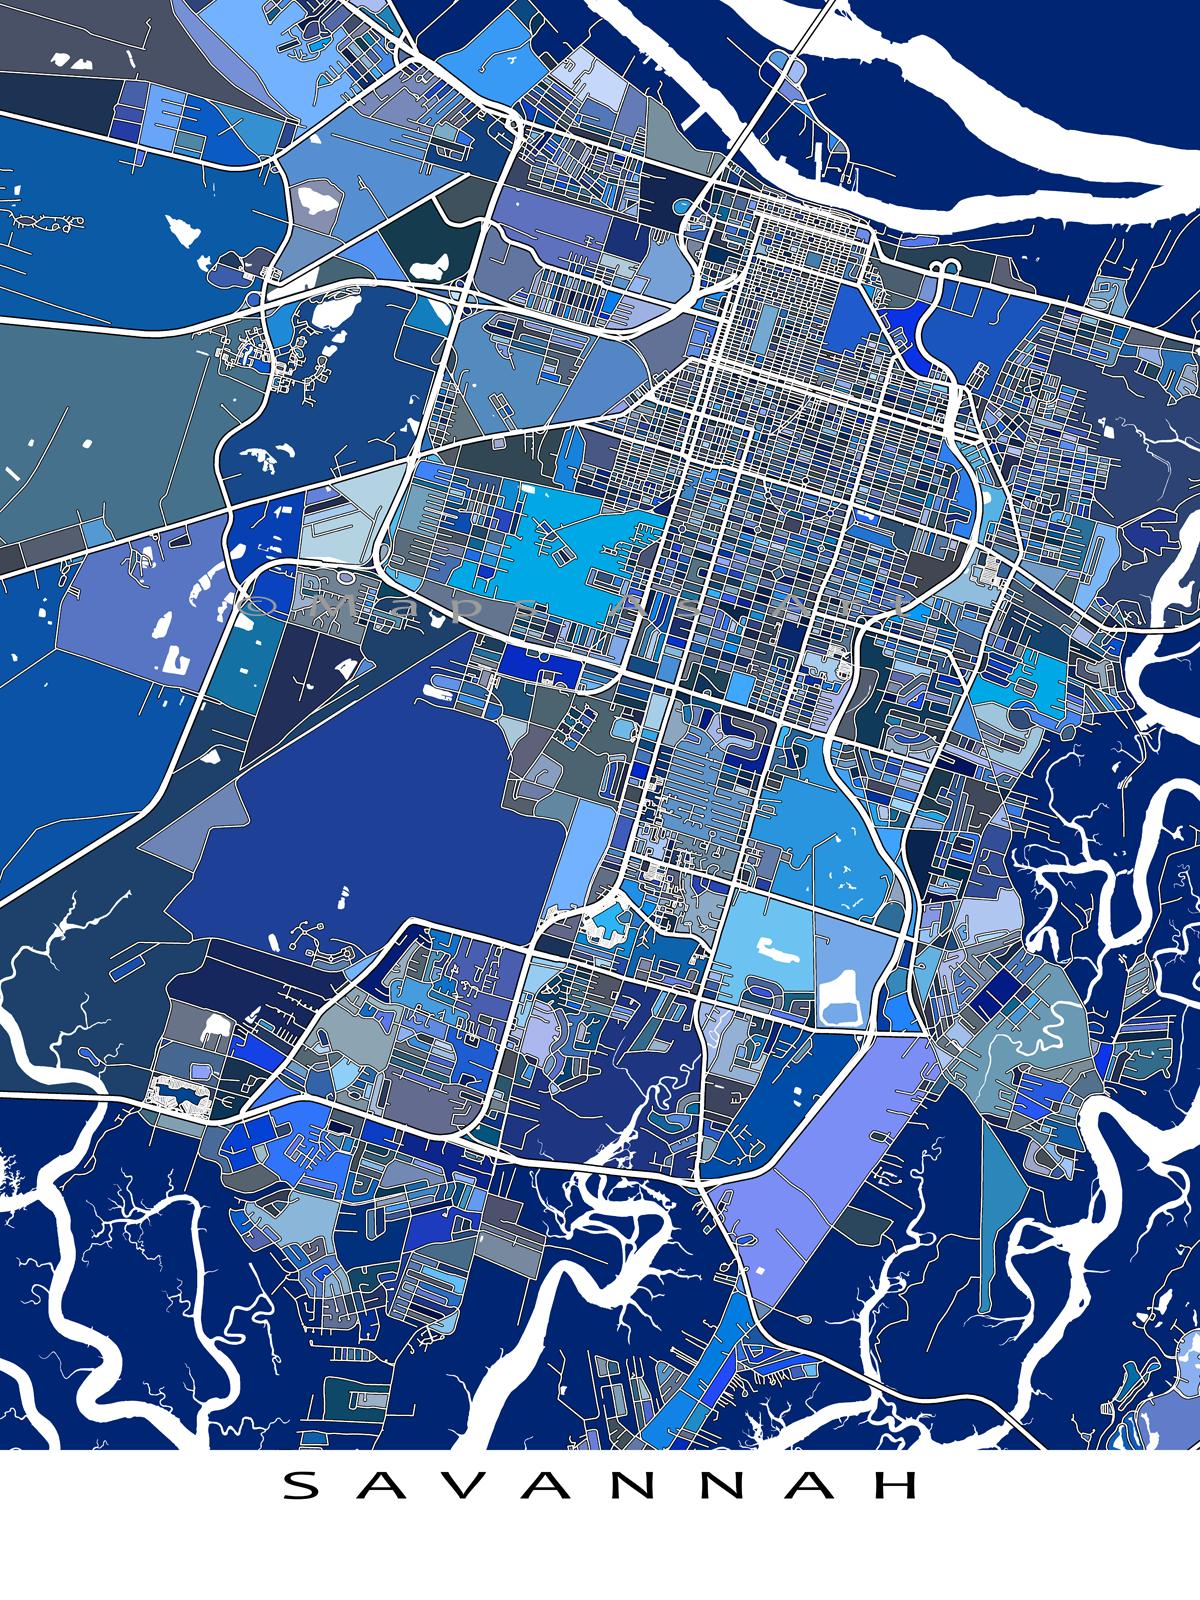 Best Ideas About Map Of Savannah Ga On Pinterest Savannah Ga - Georgia usa airports map